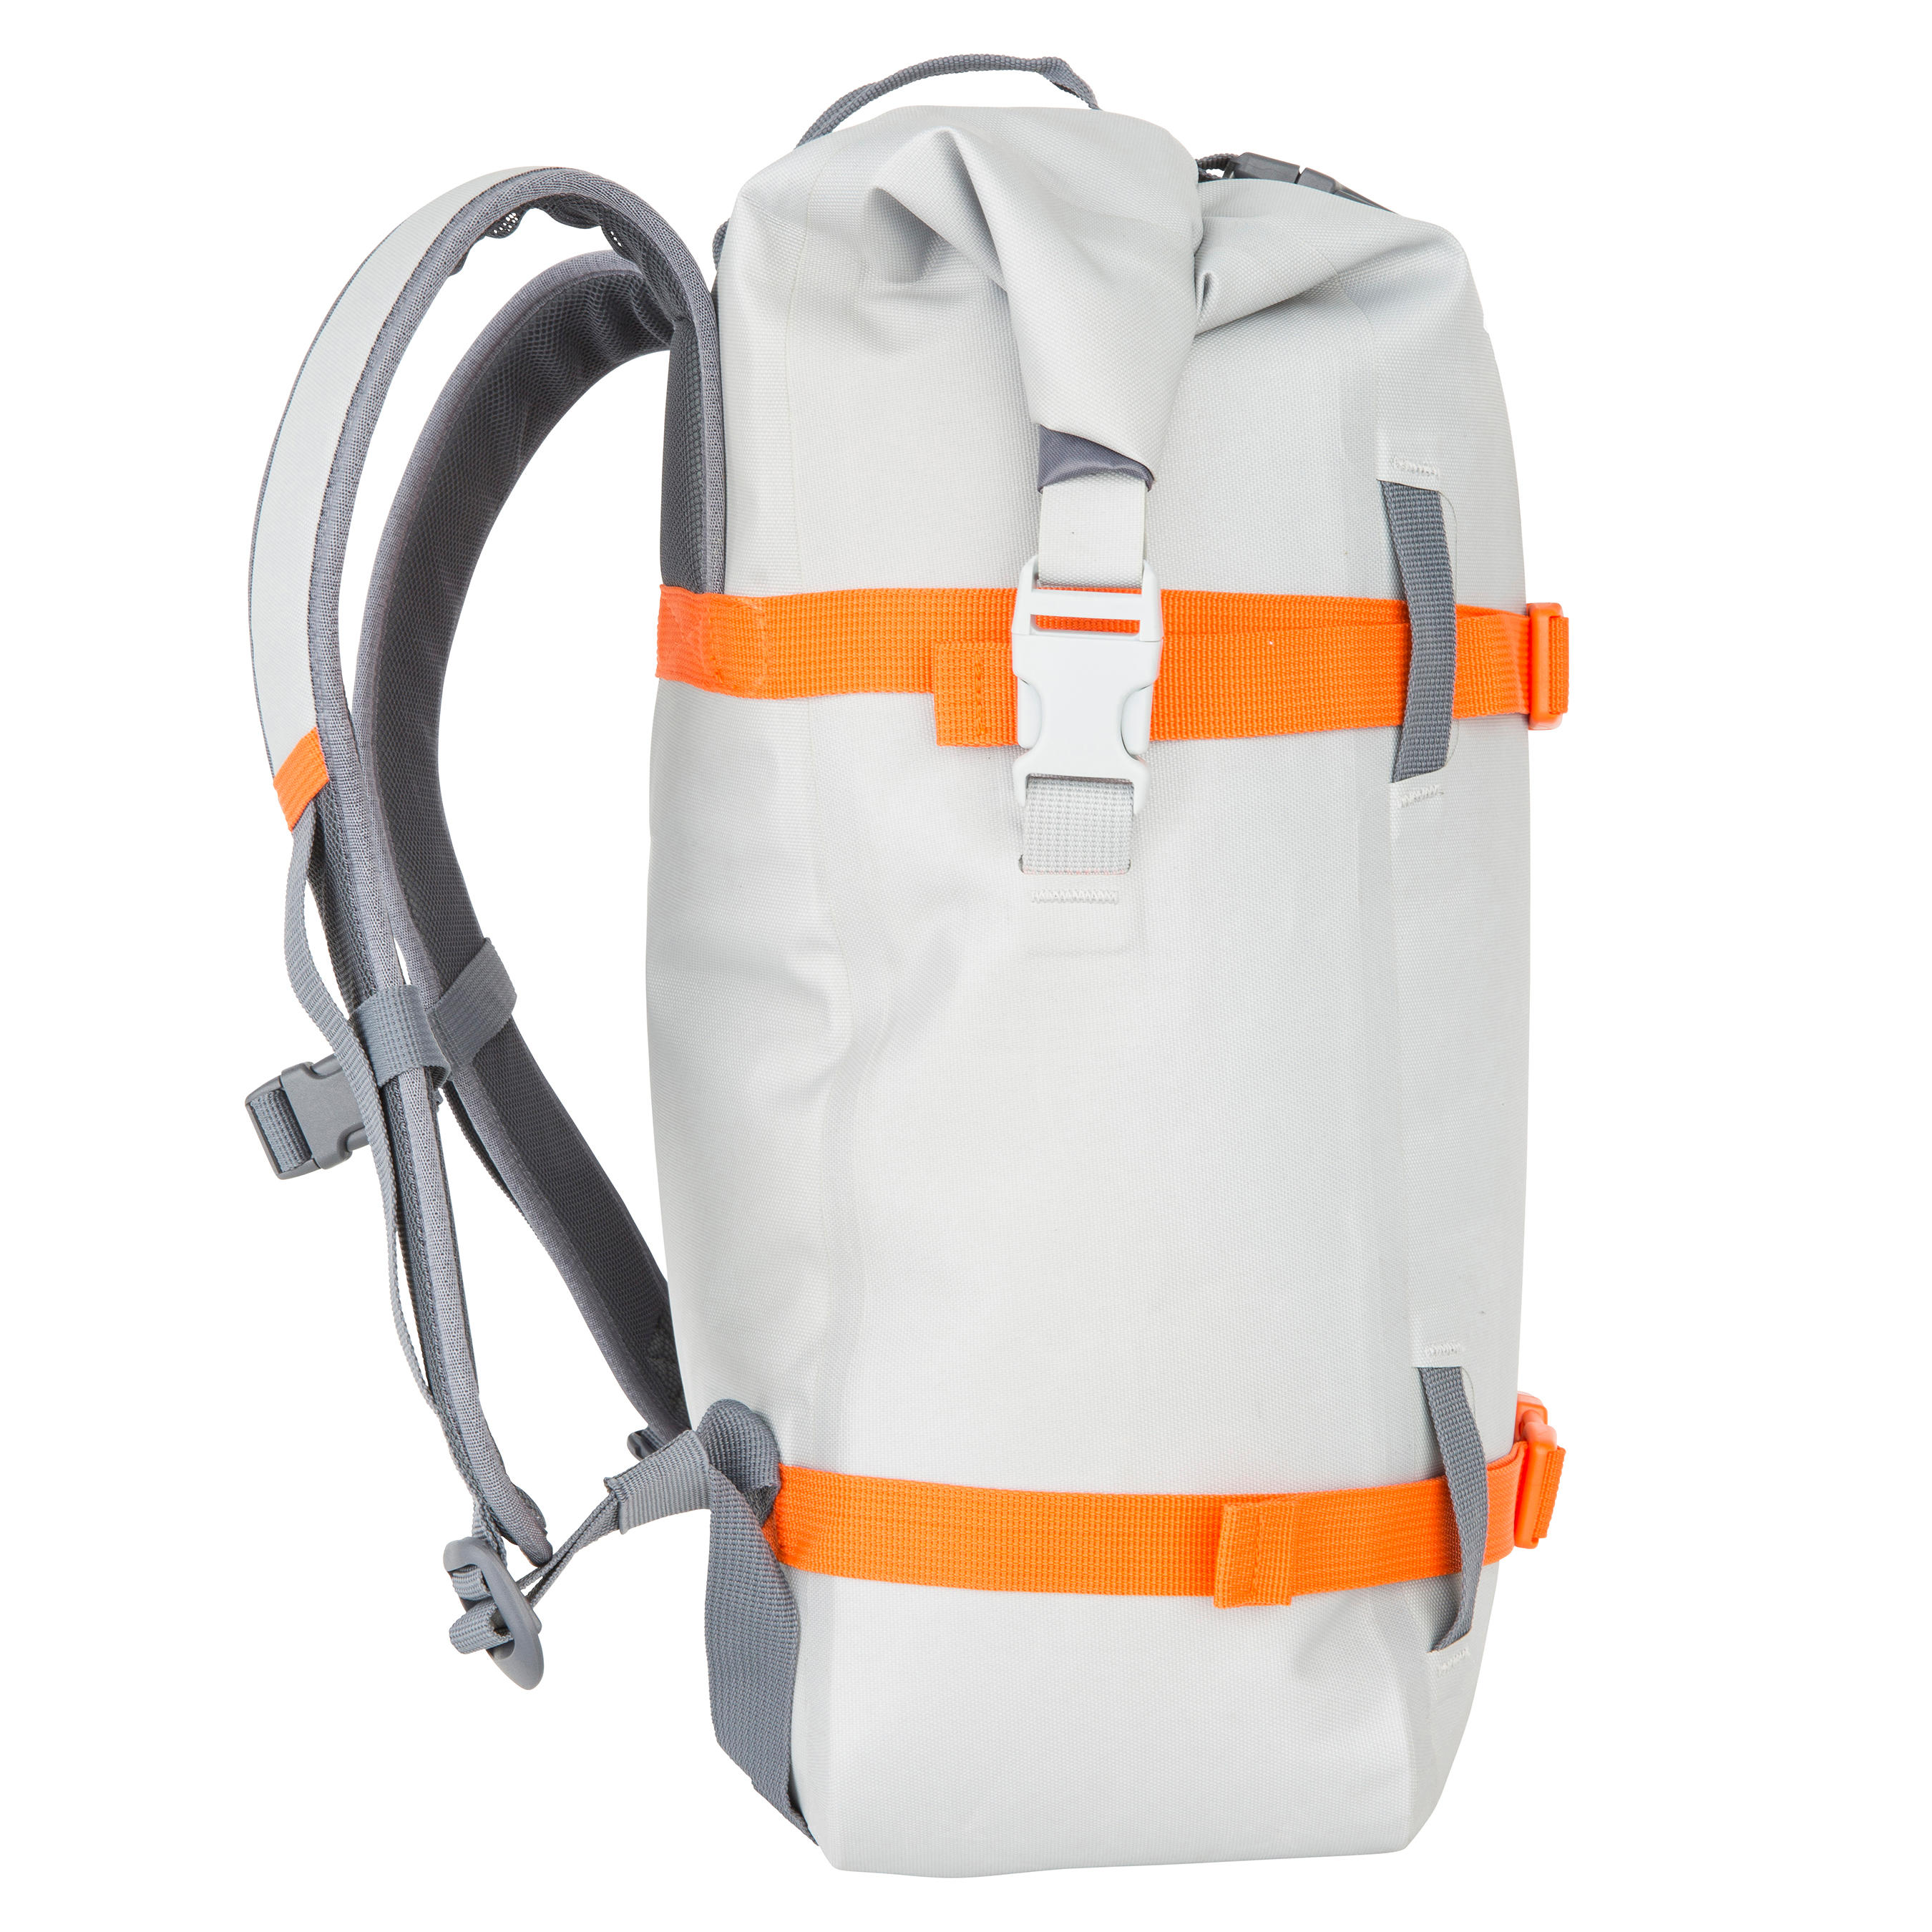 20L Watertight Backpack - Grey